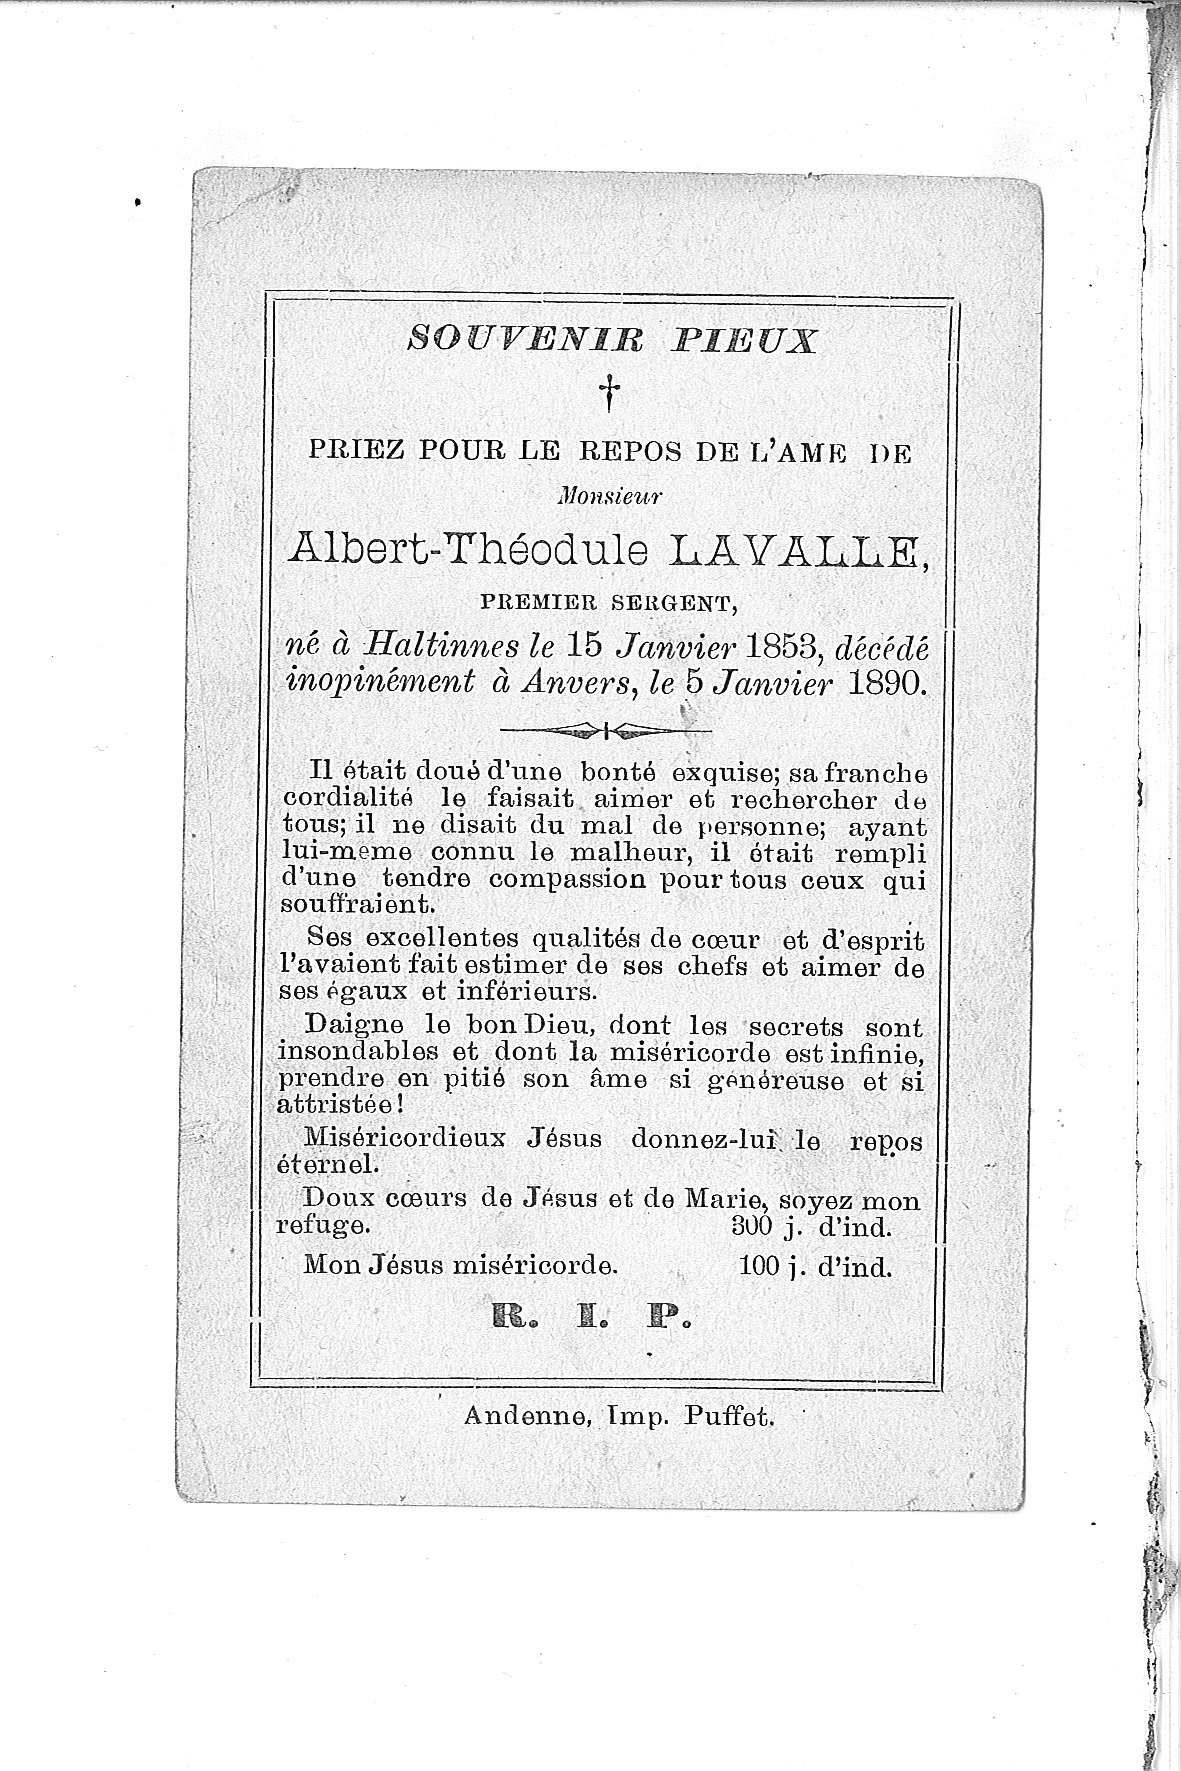 Albert-THéodule20111115141054_00025.jpg